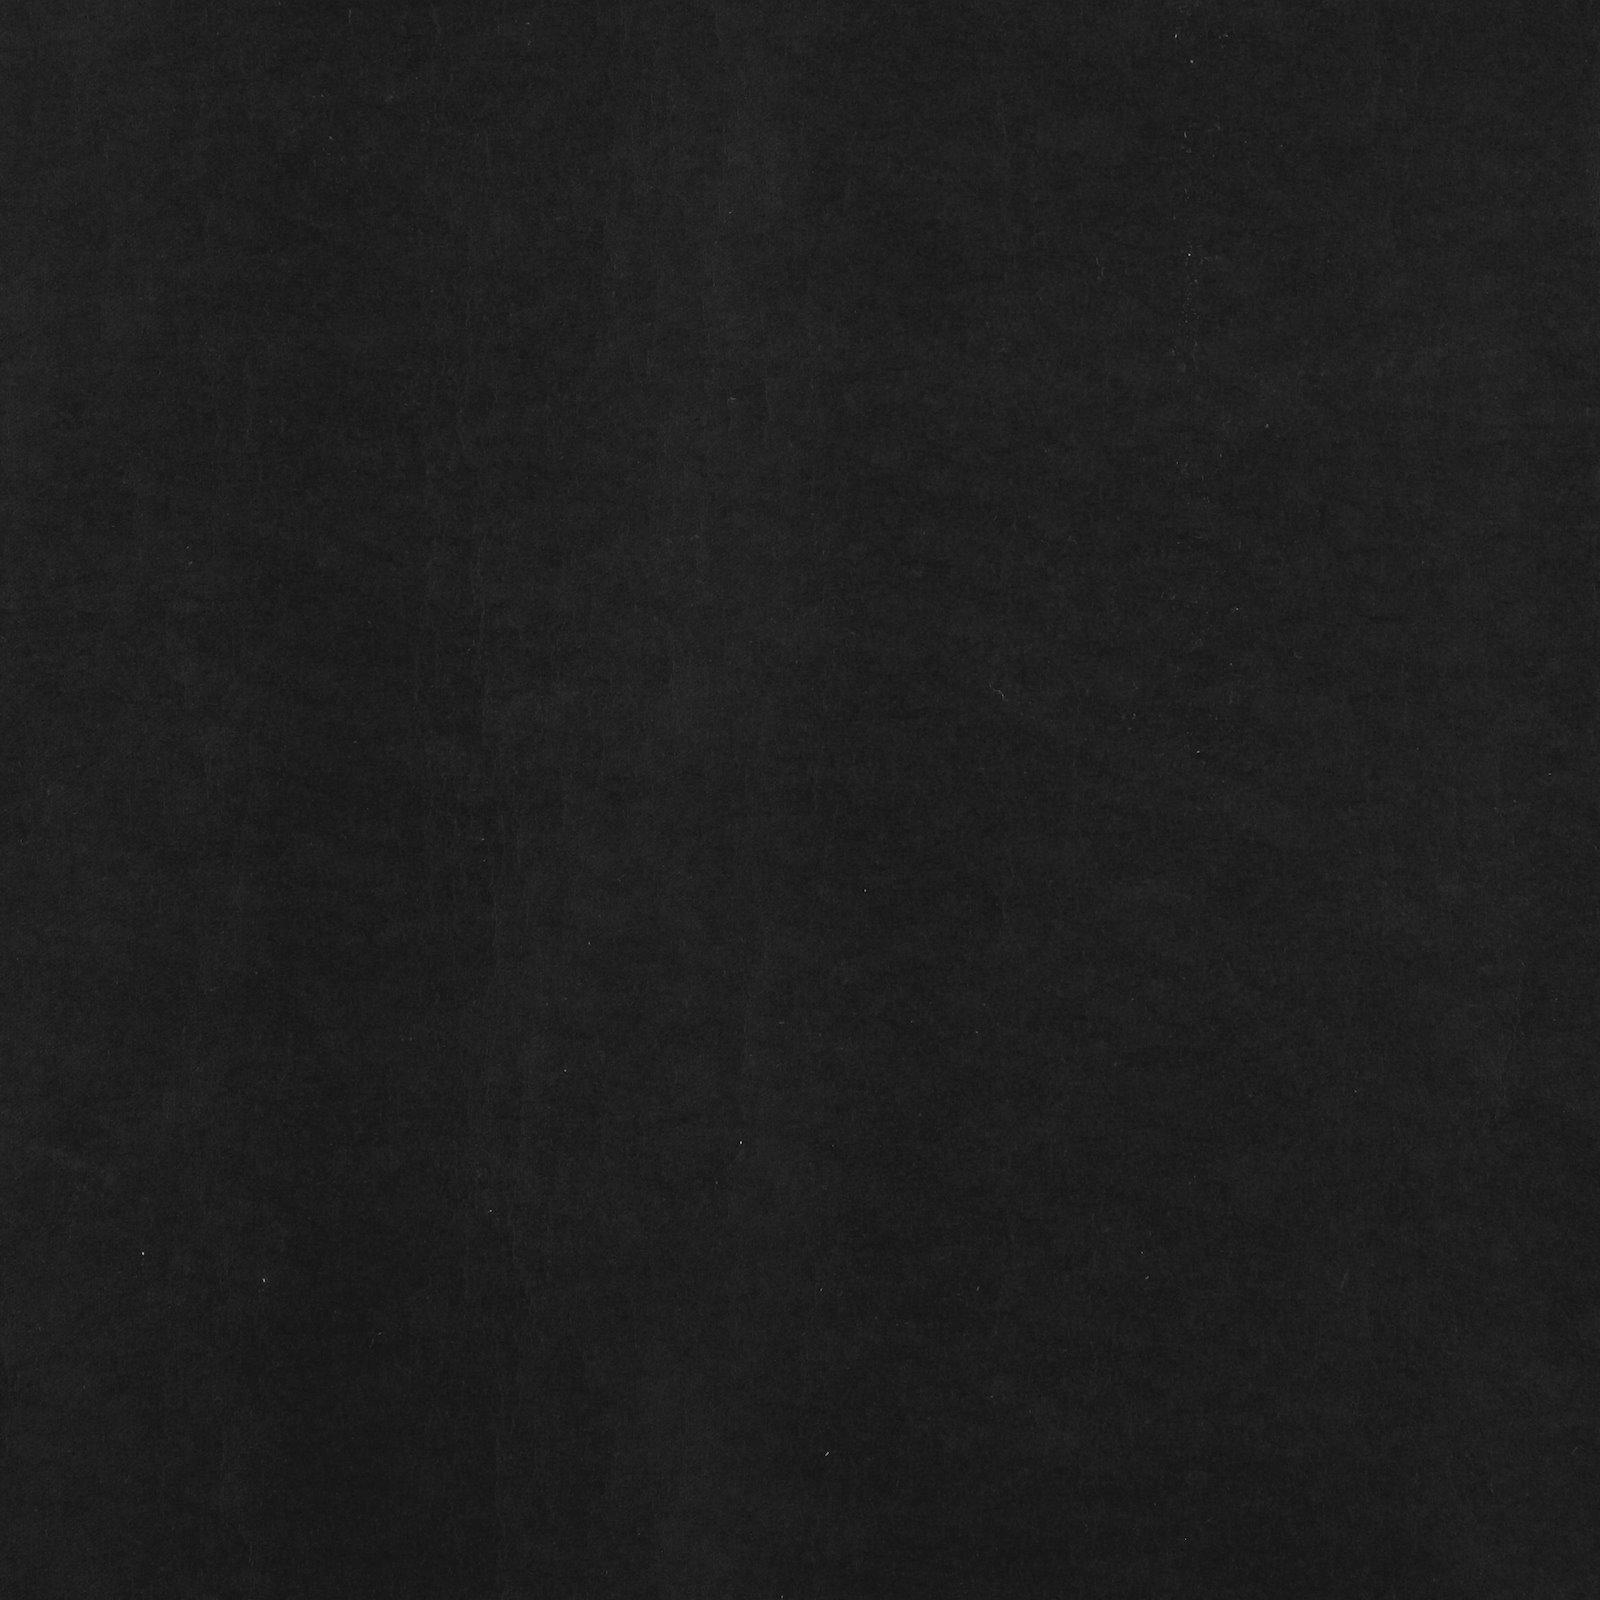 PAP FAB Schwarz, 75x100 cm